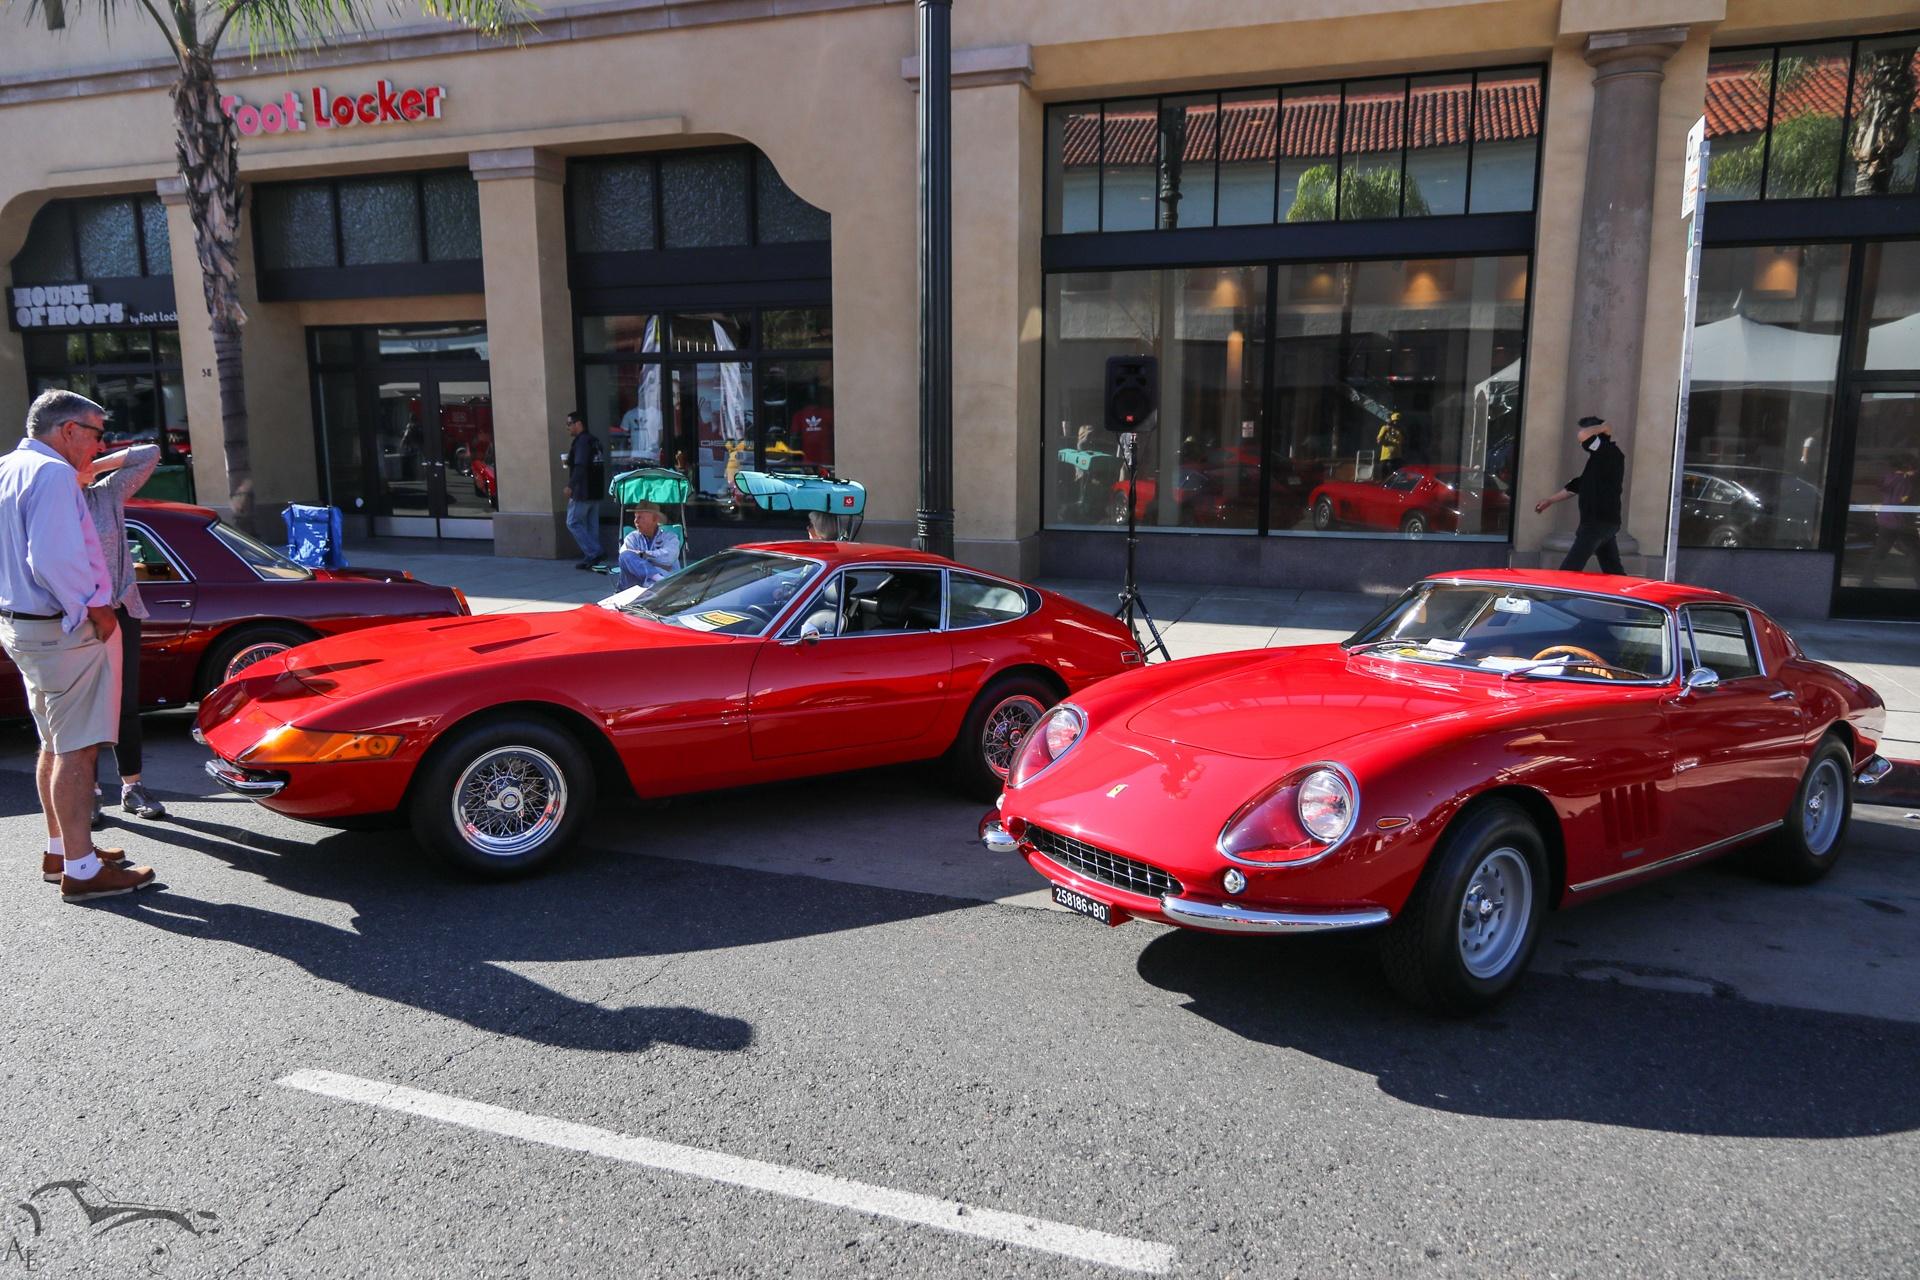 Ferrari 275 GTB and 365 GTB/4 Daytona